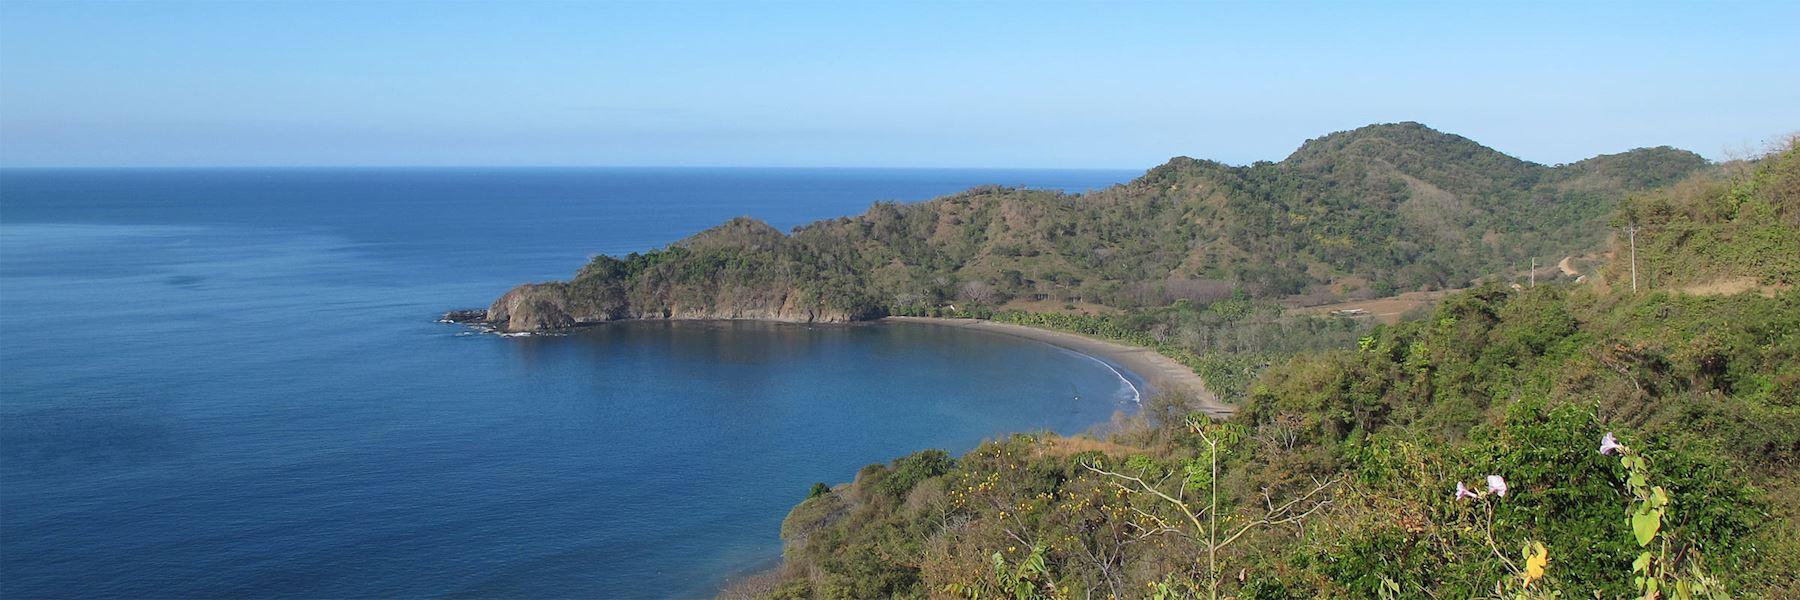 Visit Punta Islita, Costa Rica